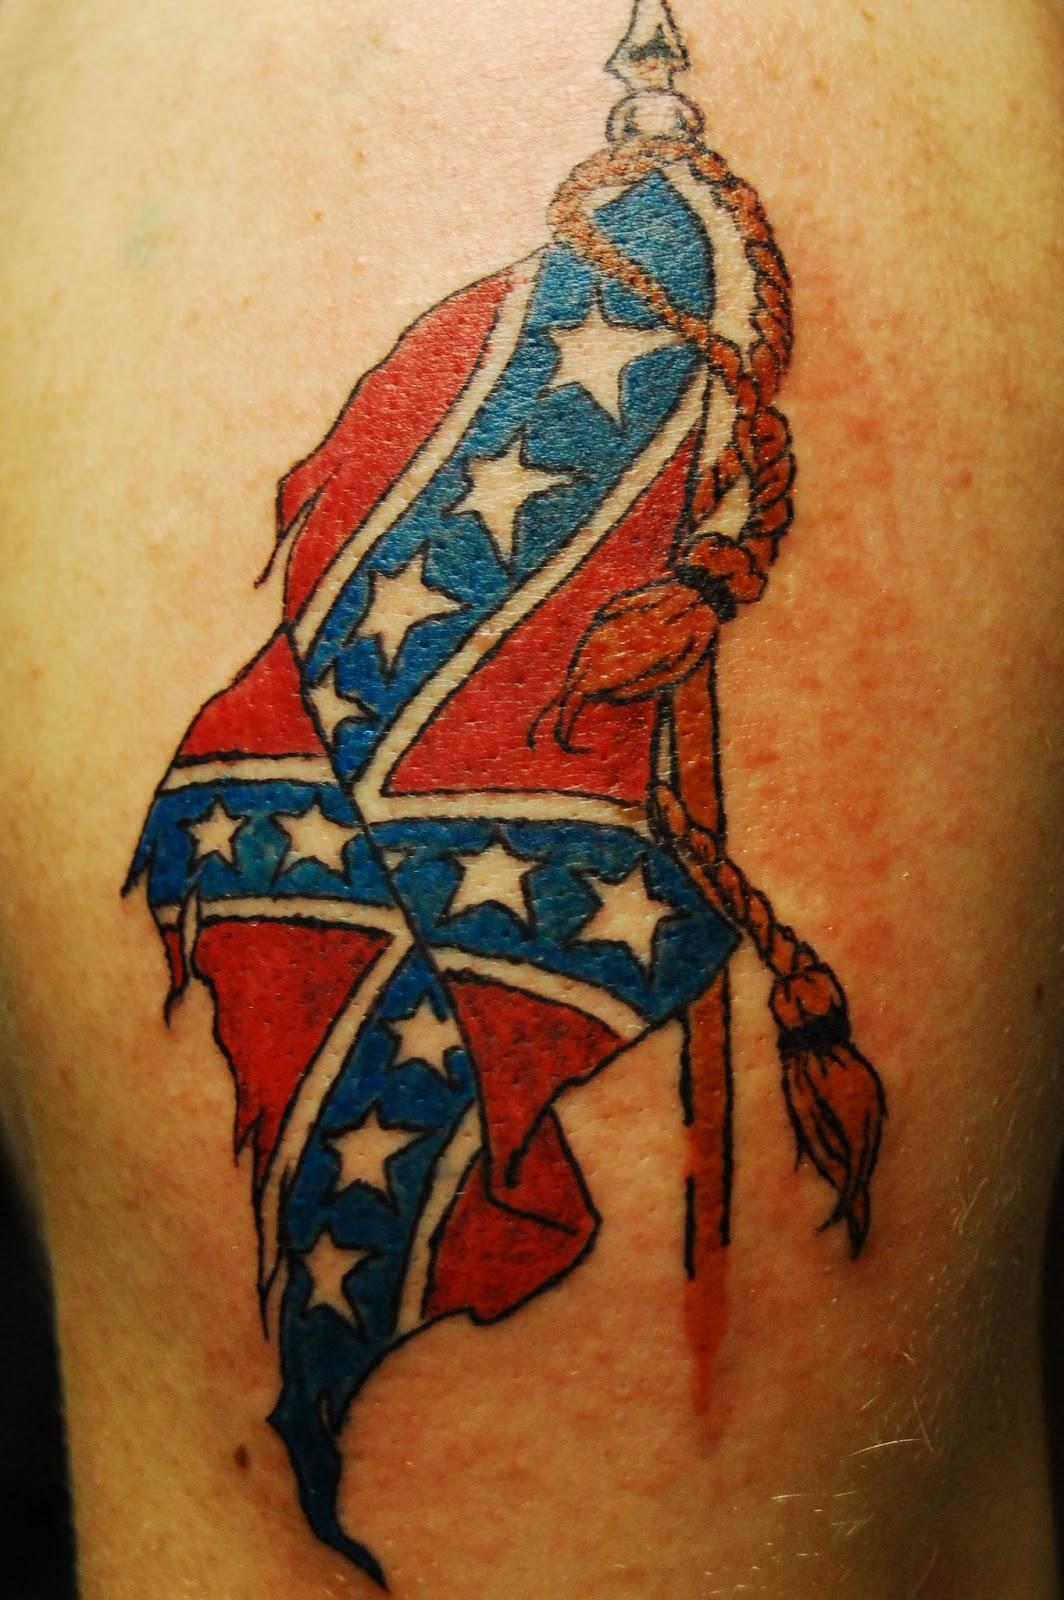 my tattoo designs confederate flag tattoos. Black Bedroom Furniture Sets. Home Design Ideas